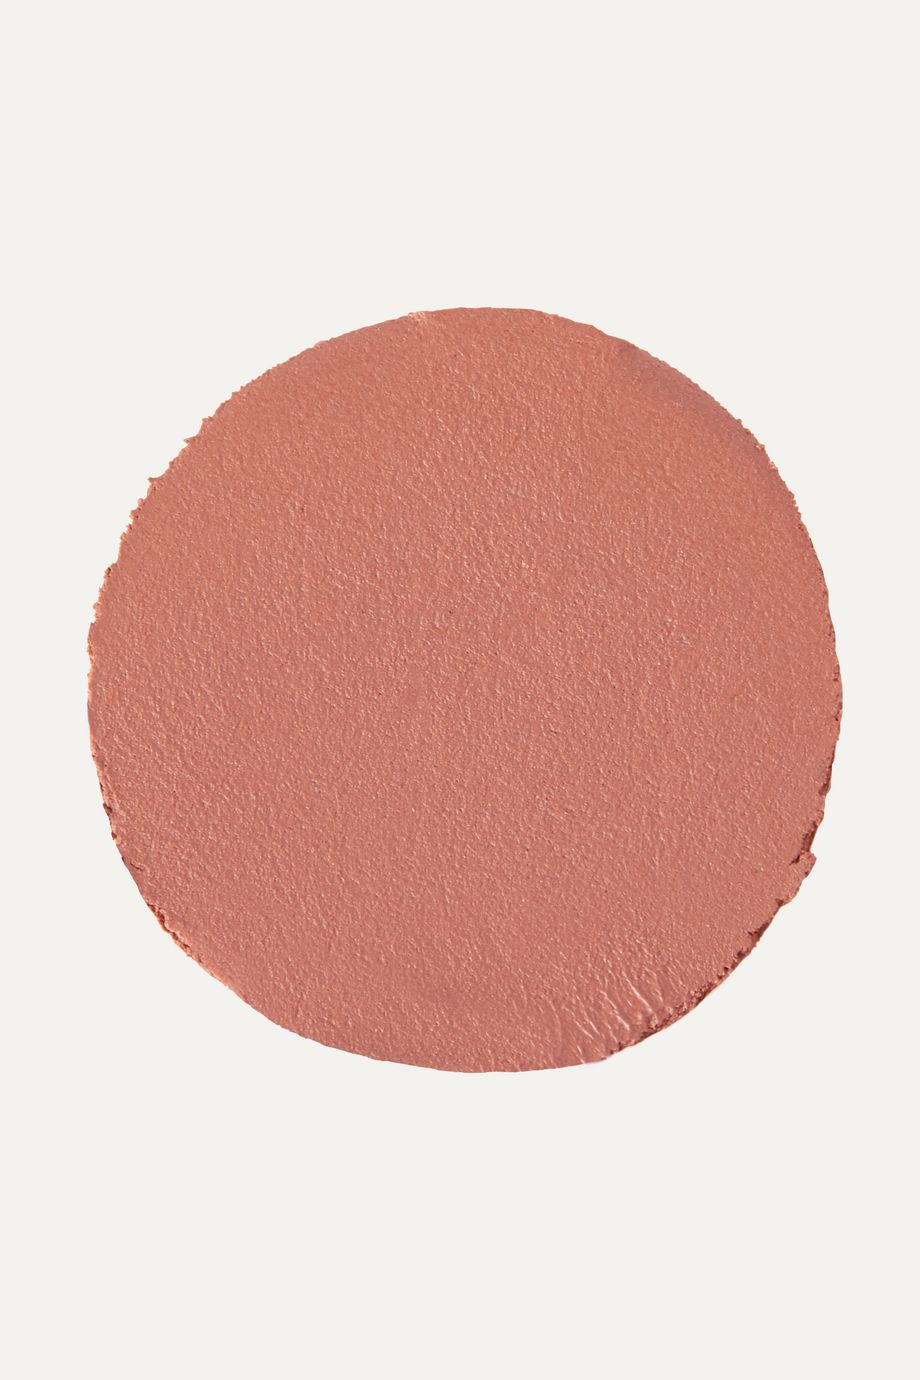 Illamasqua Antimatter Lipstick - Vela